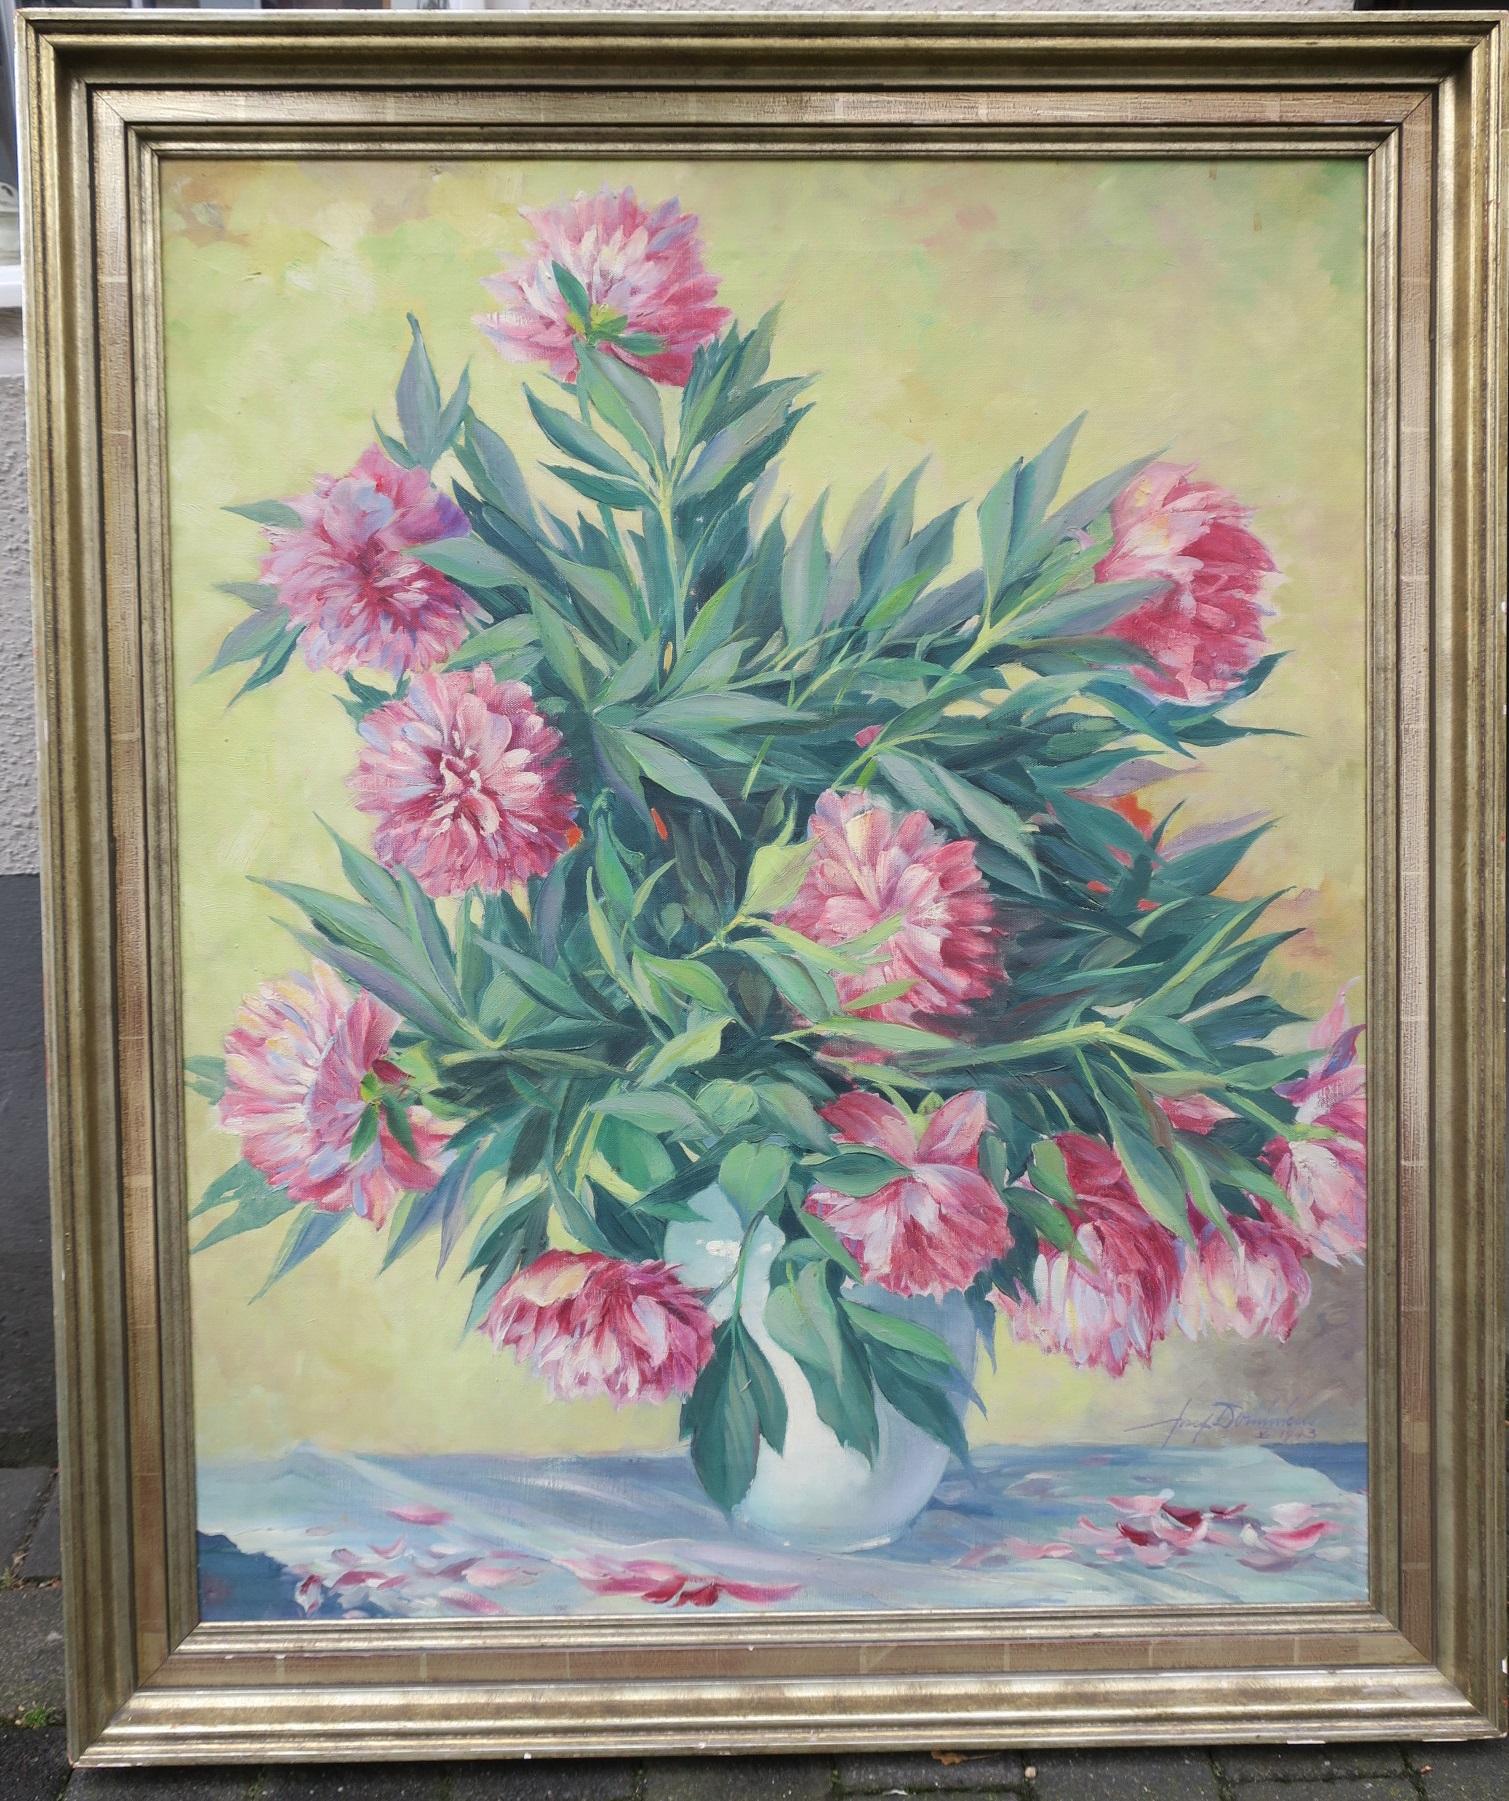 Dominicus Josef 1885 1973 Gemalde Pfingstrosen Blumen Stillleben 1943 Kunsthandel Hagedorn